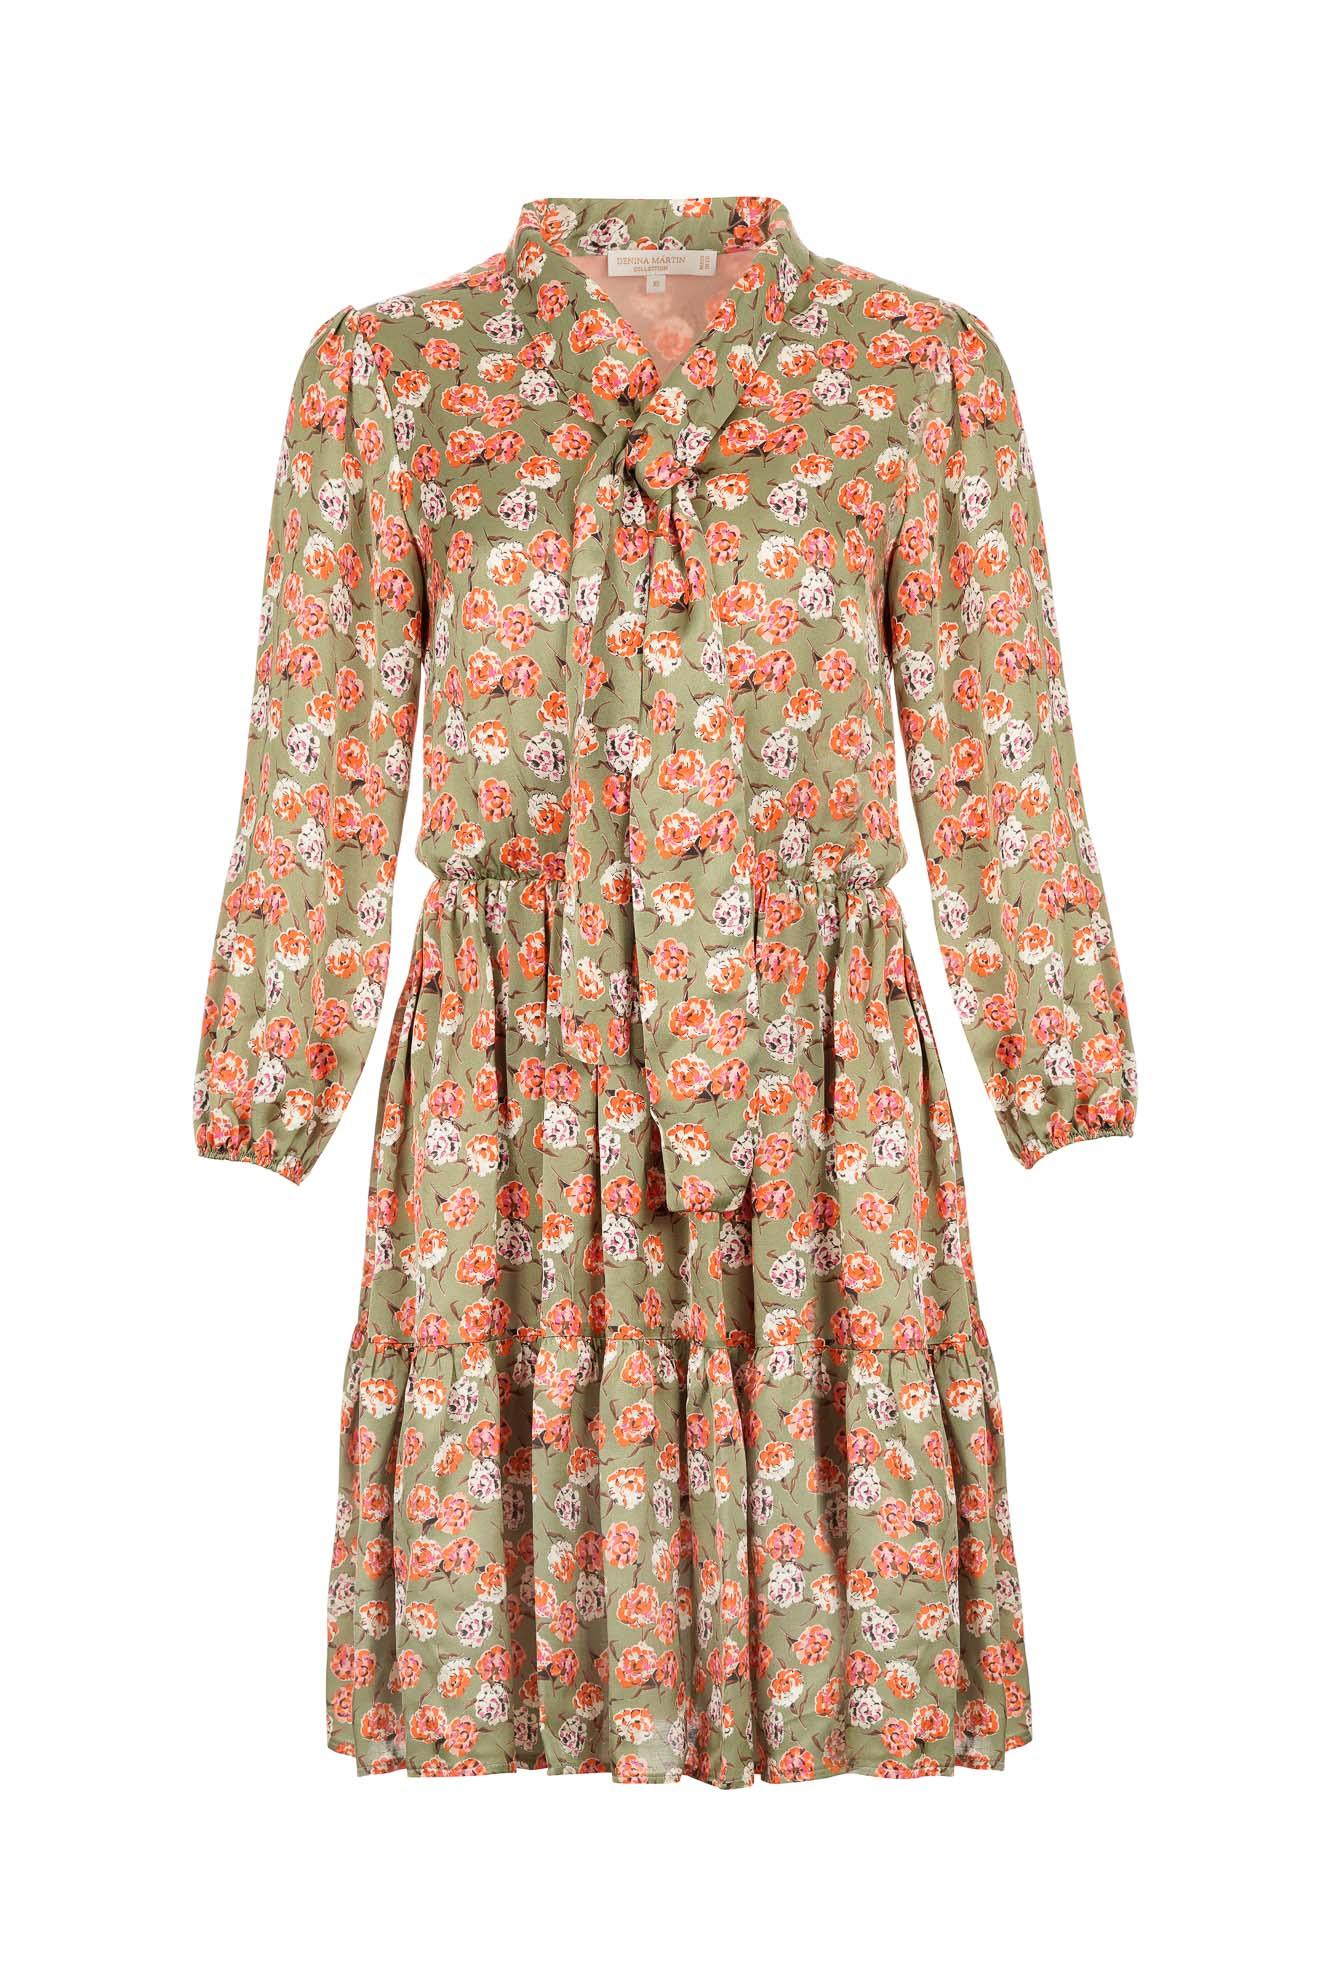 Denina Martin dress